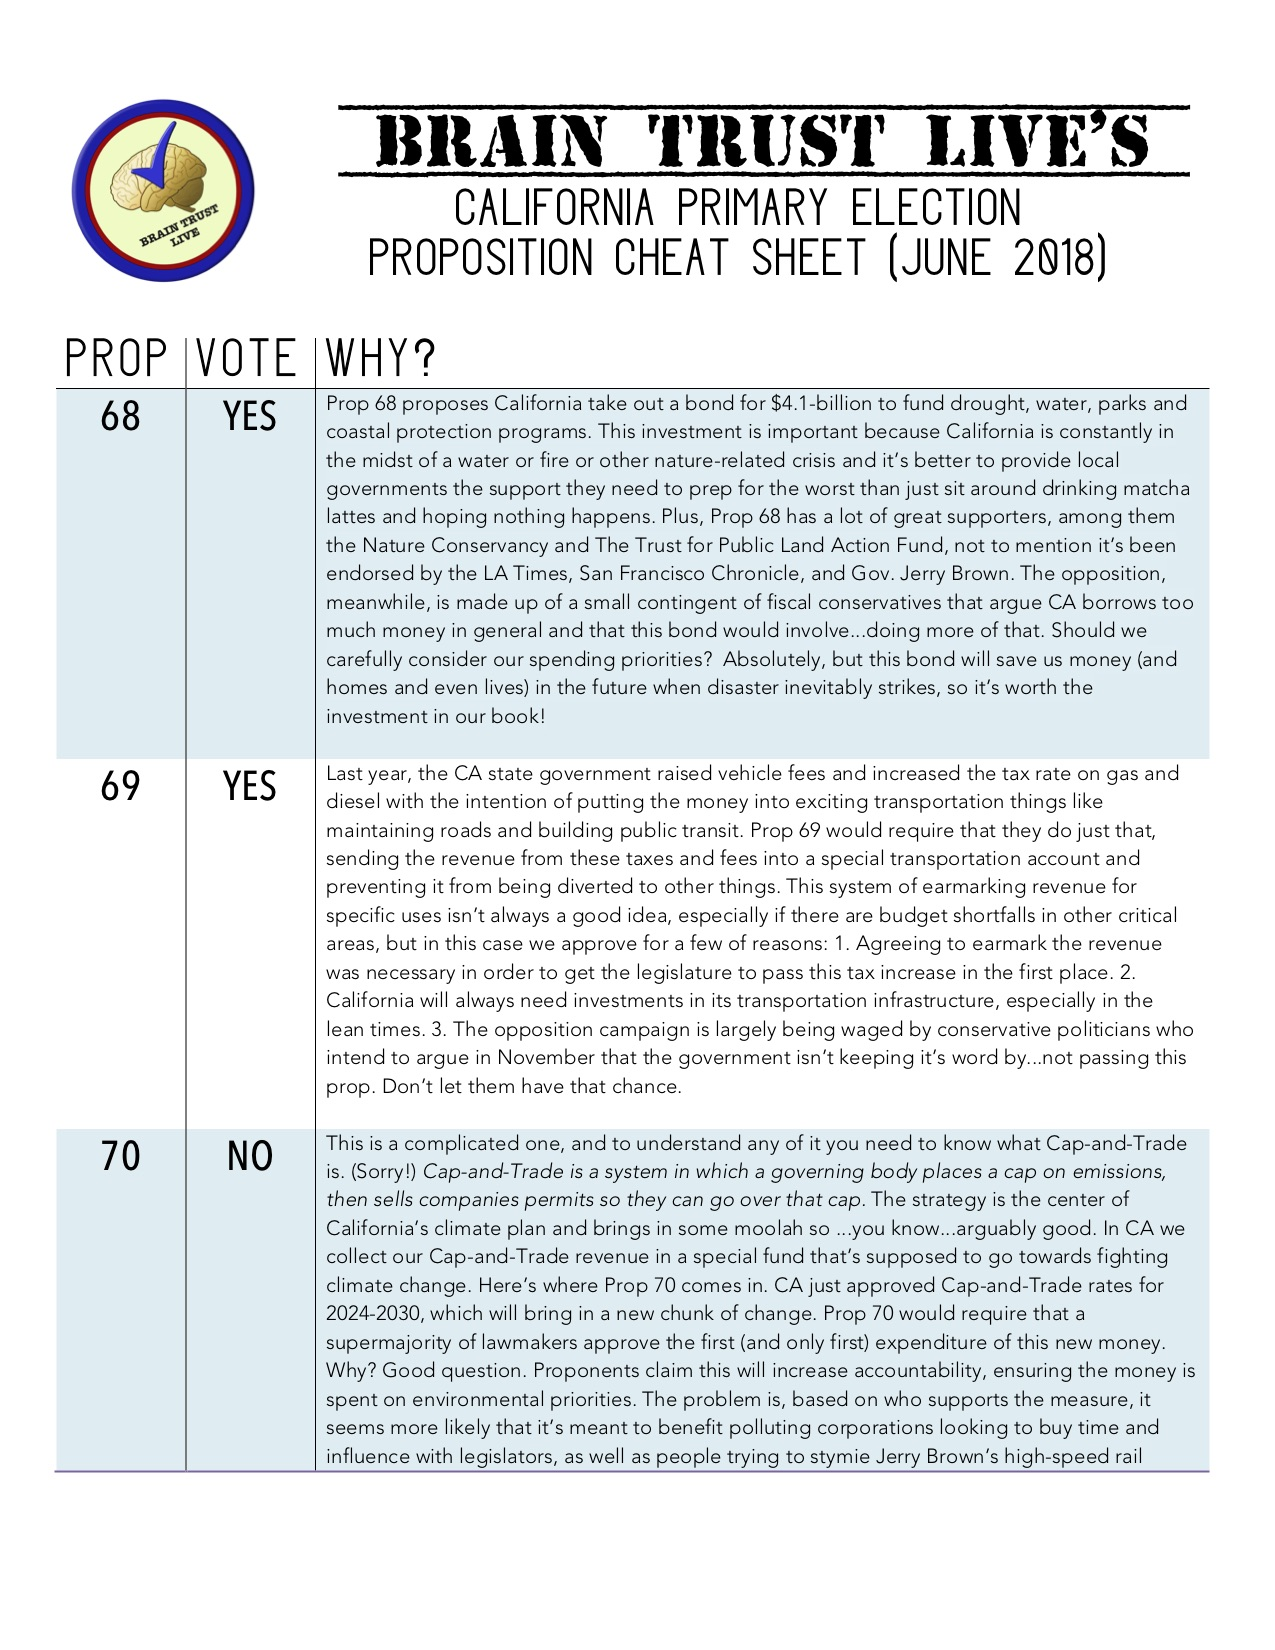 California Primary Election Prop Cheatsheet (June 2018) — Brain